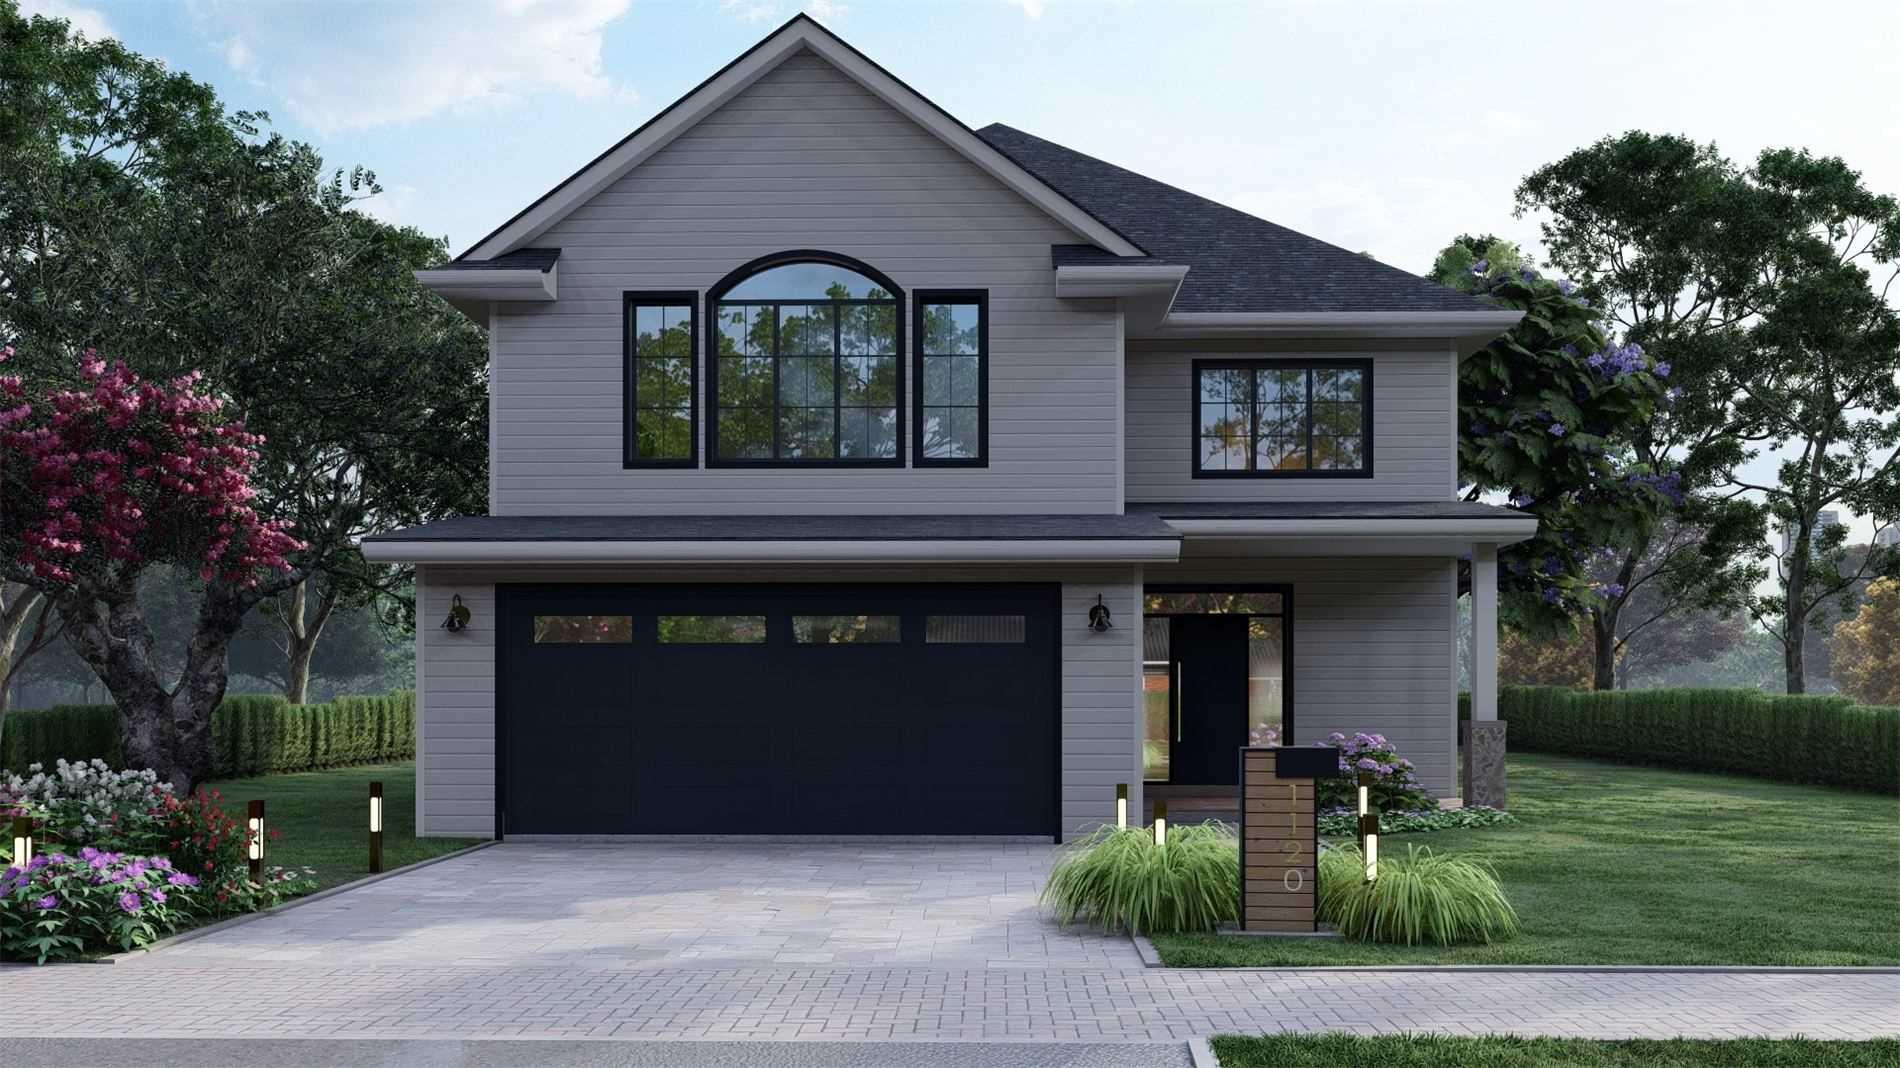 533 Cathcart Blvd, Sarnia, Ontario N7V2N1, 3 Bedrooms Bedrooms, 12 Rooms Rooms,3 BathroomsBathrooms,Detached,For Sale,Cathcart,X5316723